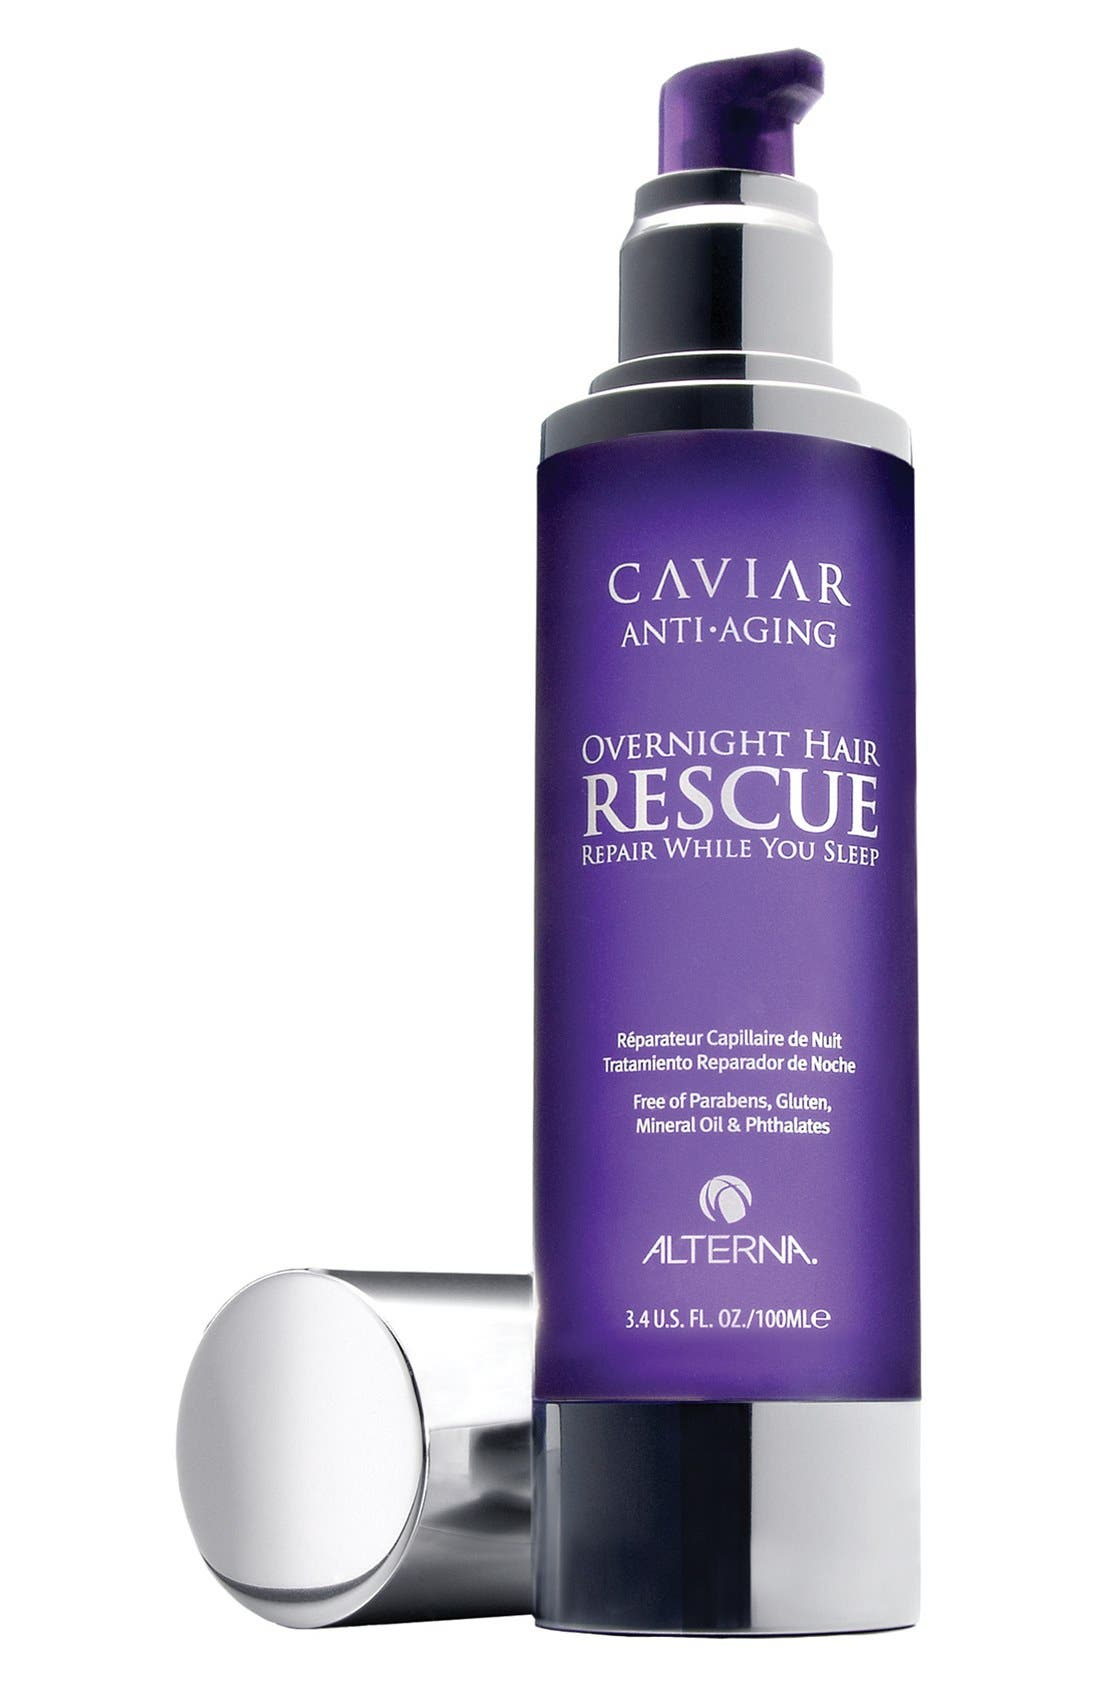 Caviar Anti-Aging Overnight Hair Rescue Hair Treatment,                             Main thumbnail 1, color,                             000